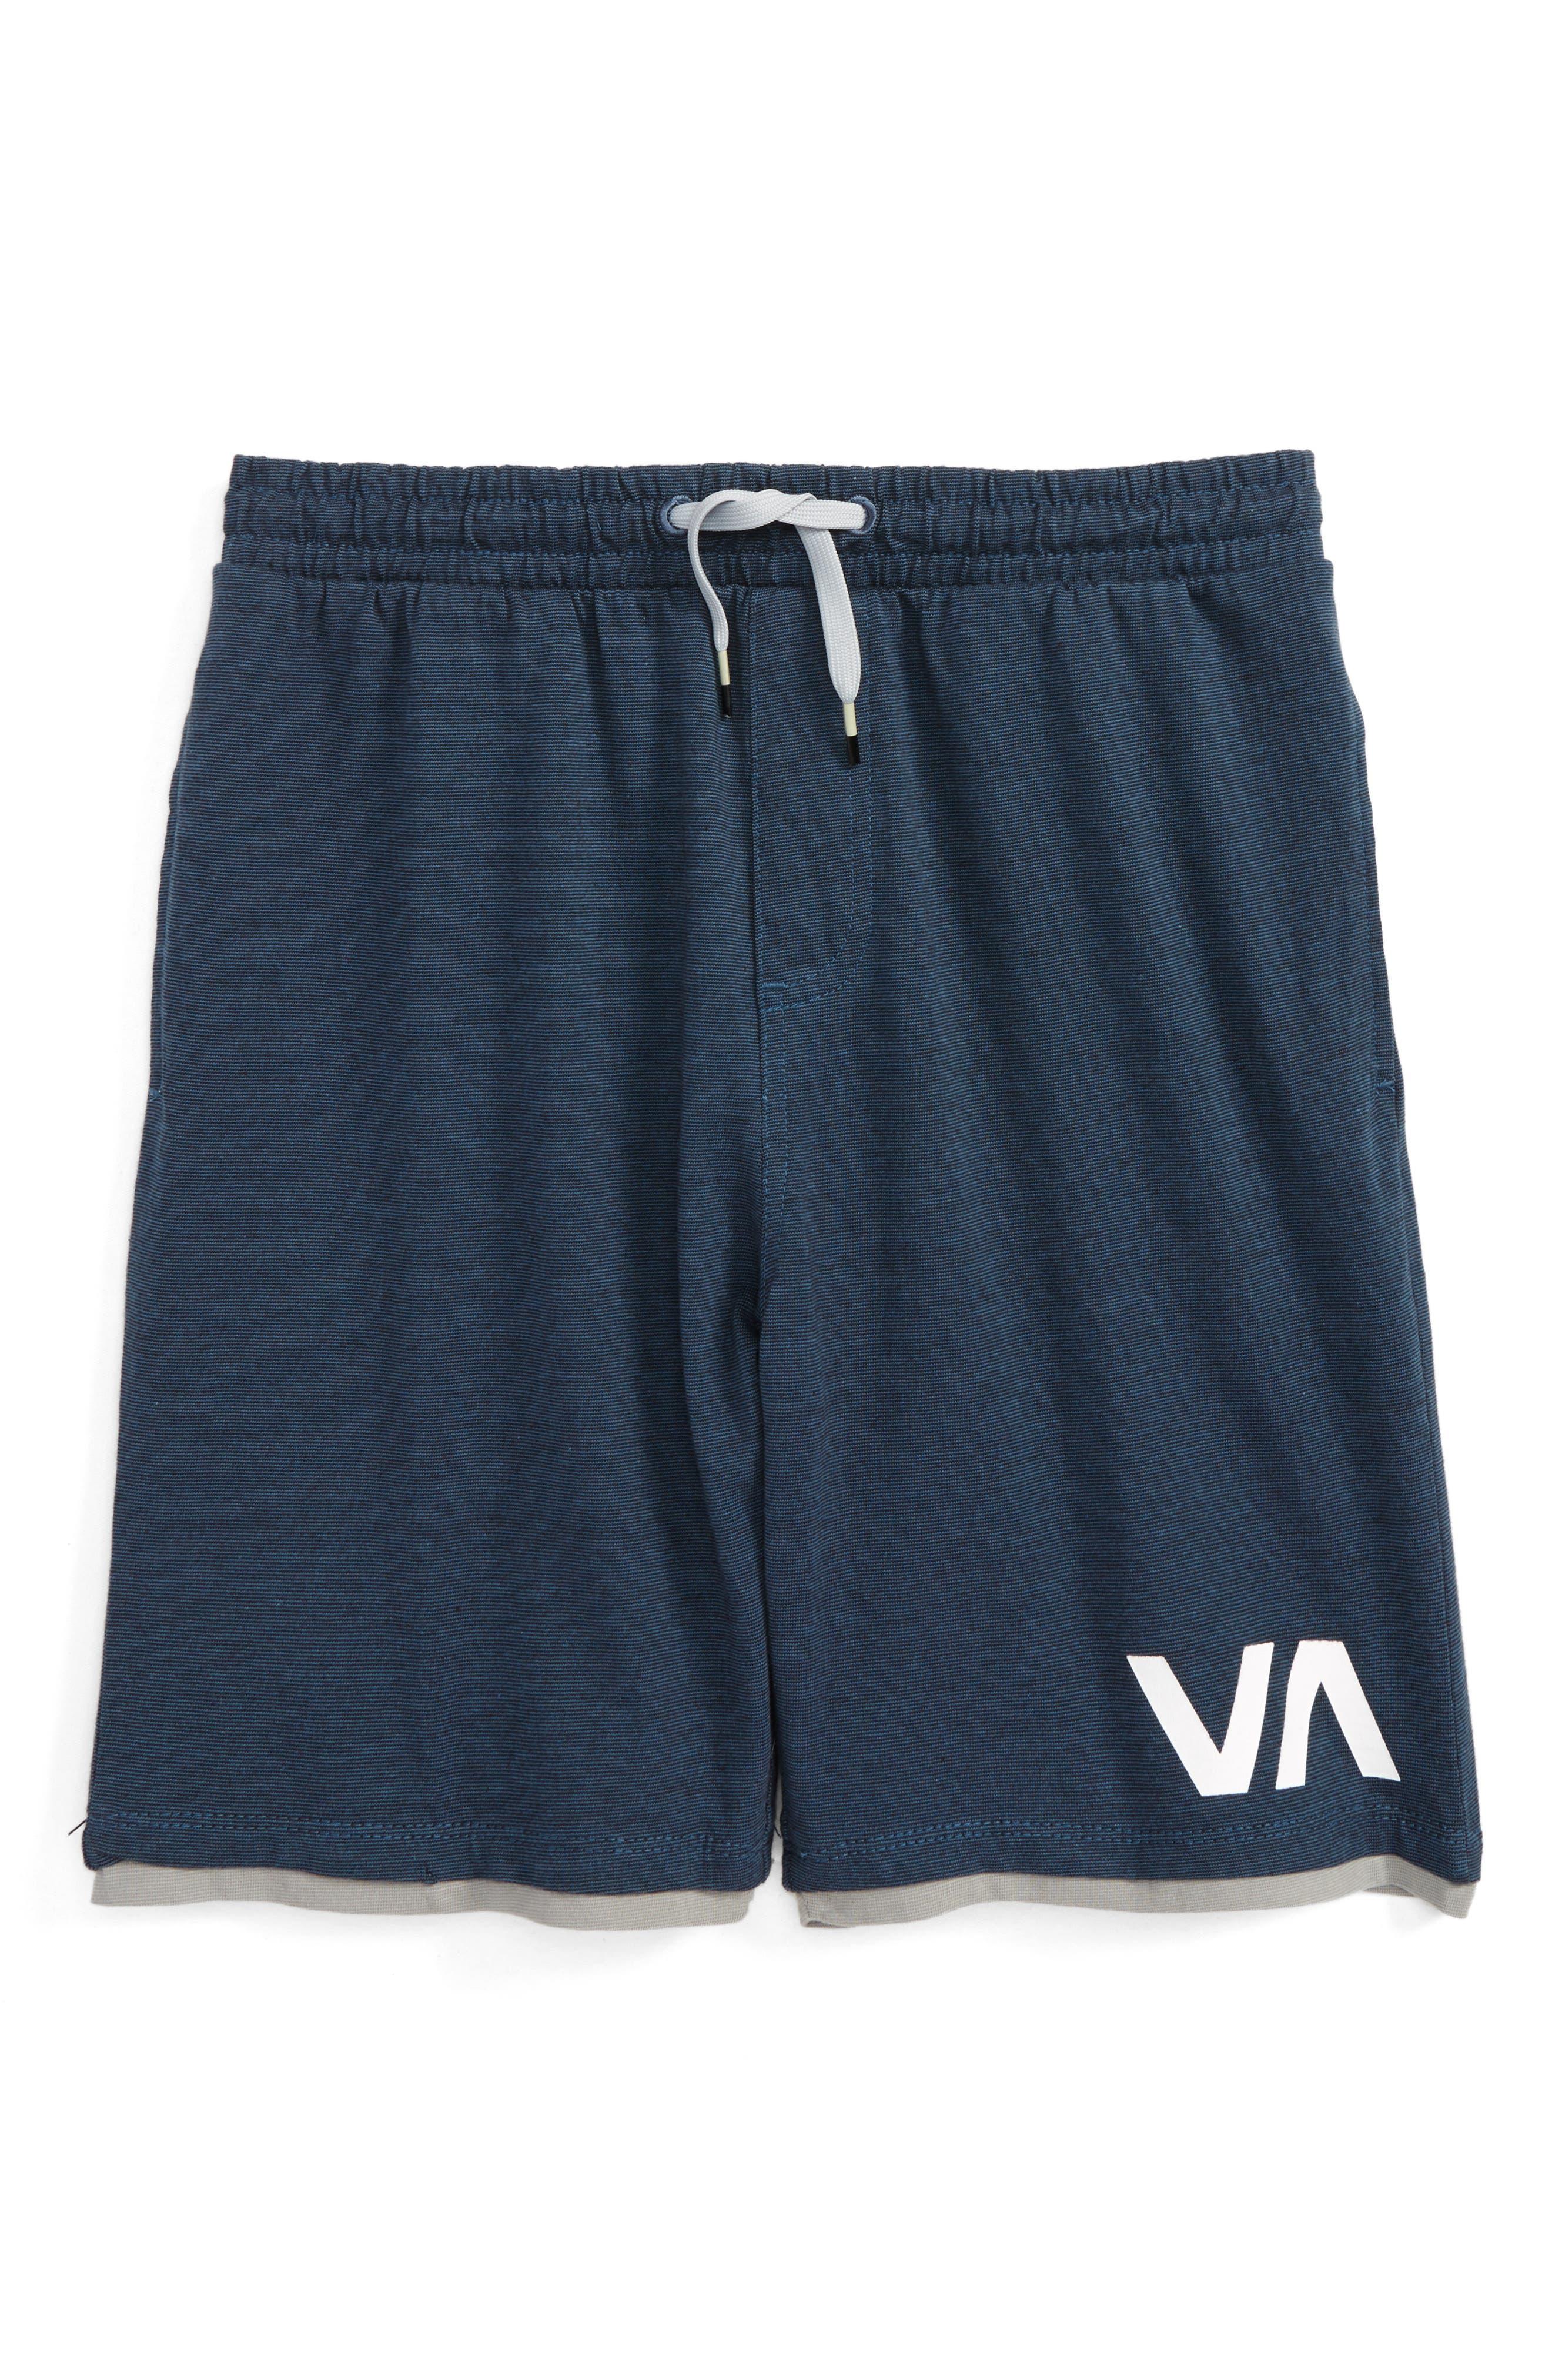 RVCA Layers II Shorts (Big Boys)